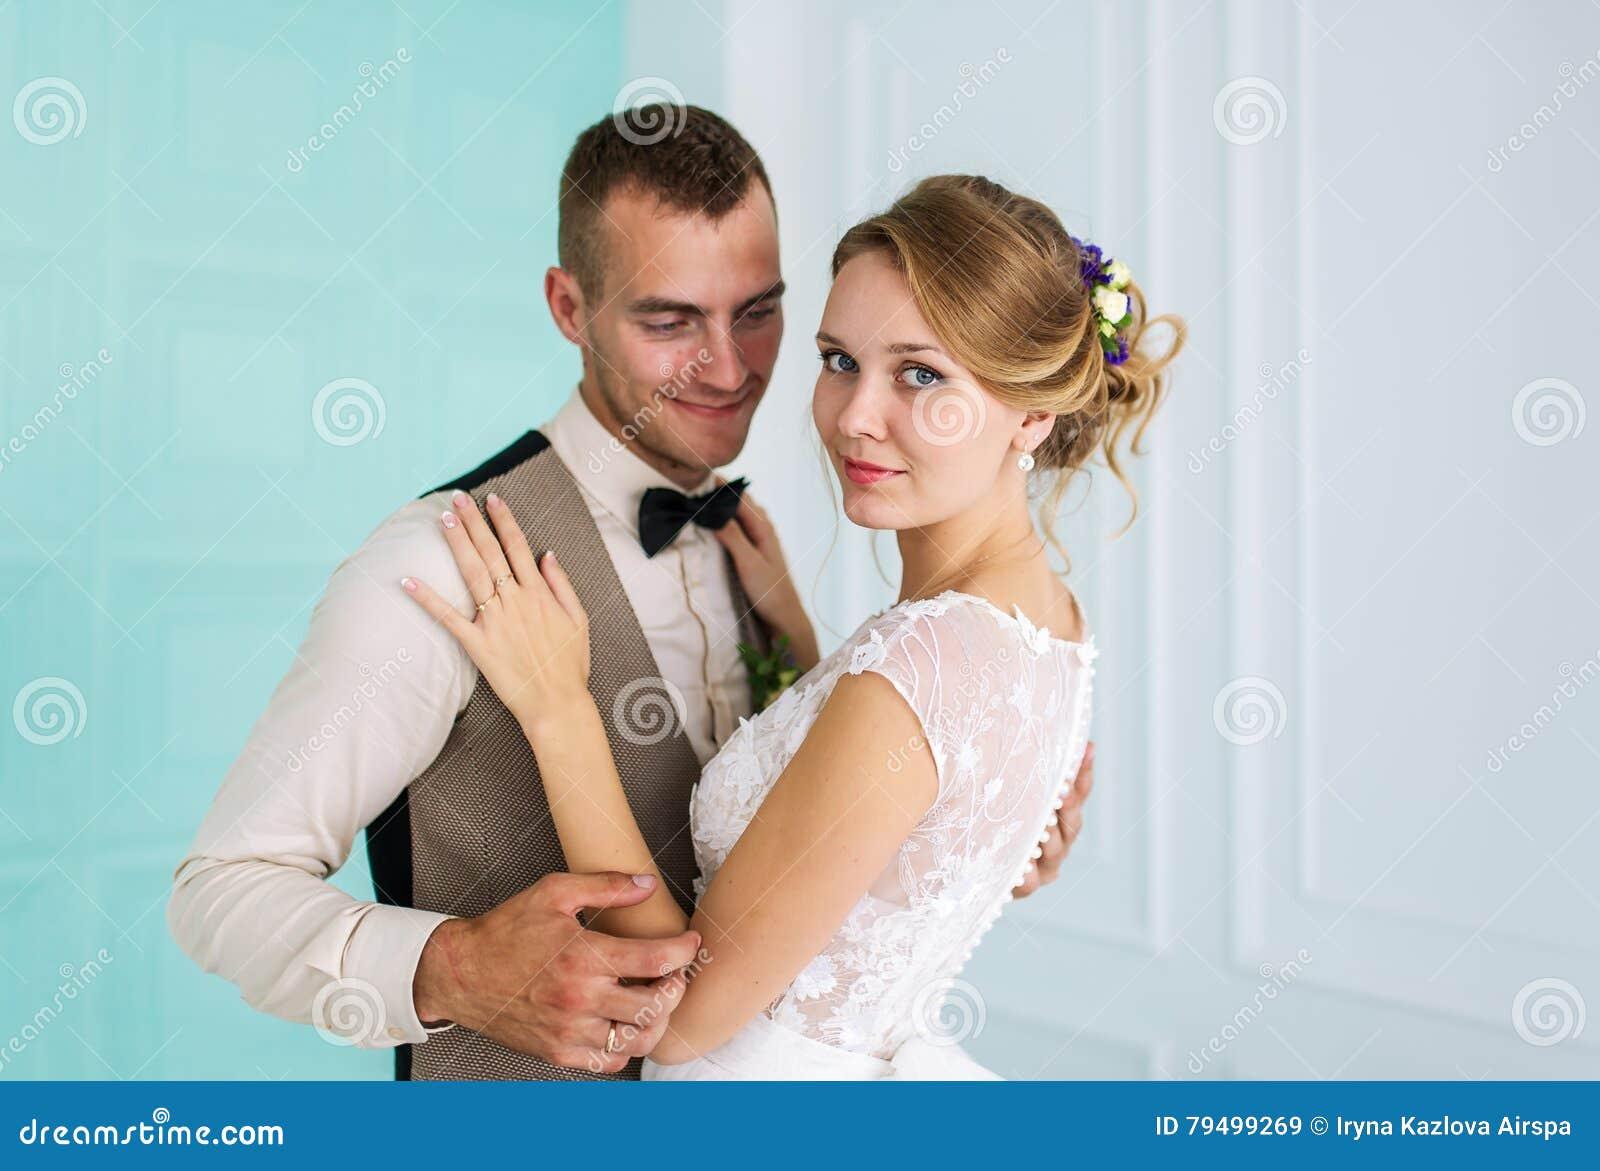 Брызгают на невест фото фото 105-114